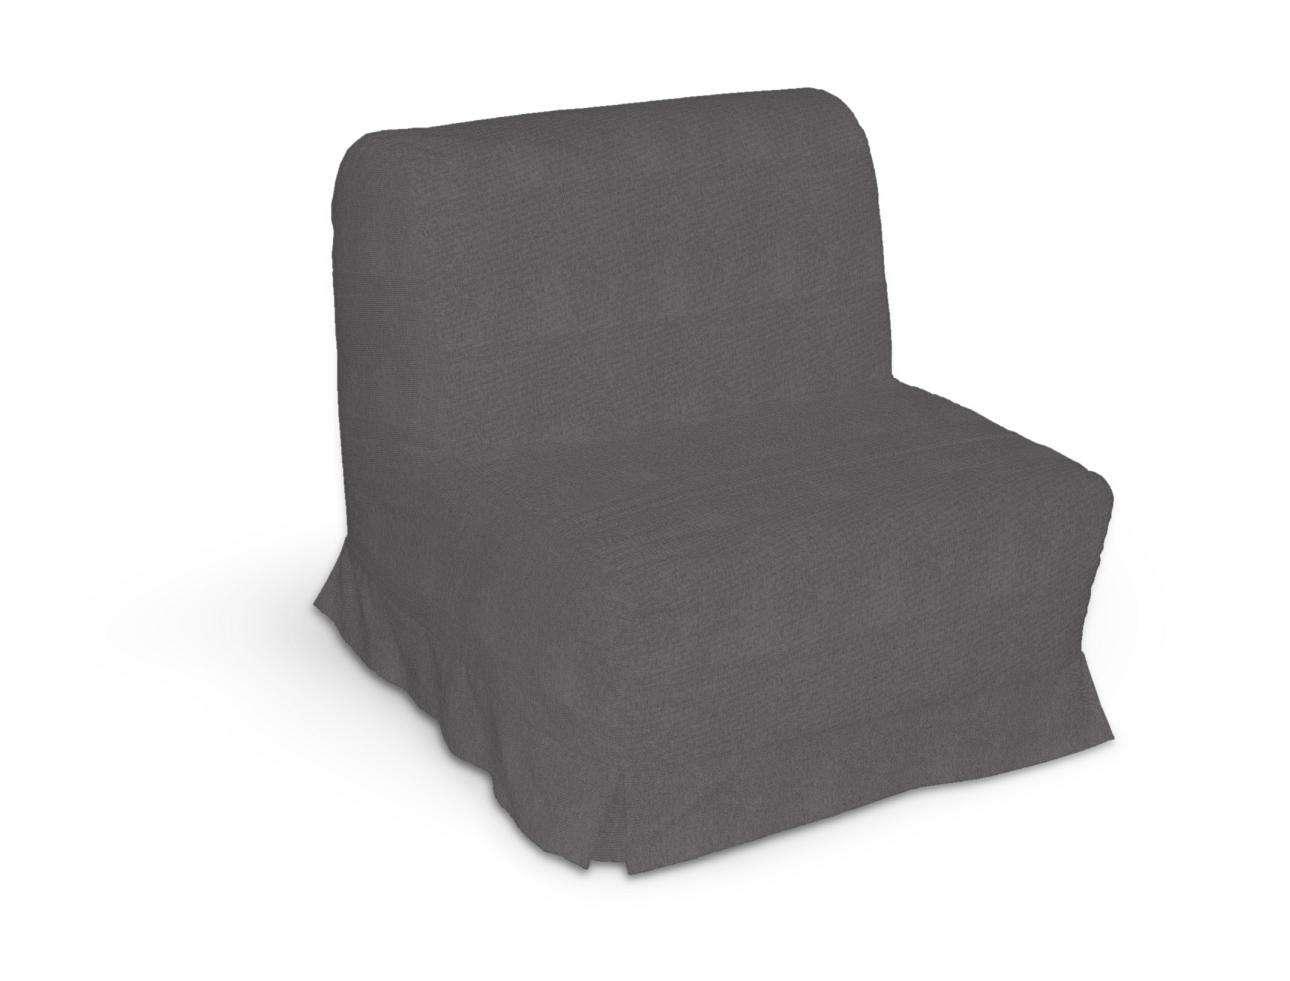 Lycksele Sesselbezug mit Kellerfalten Lycksele von der Kollektion Etna, Stoff: 705-35